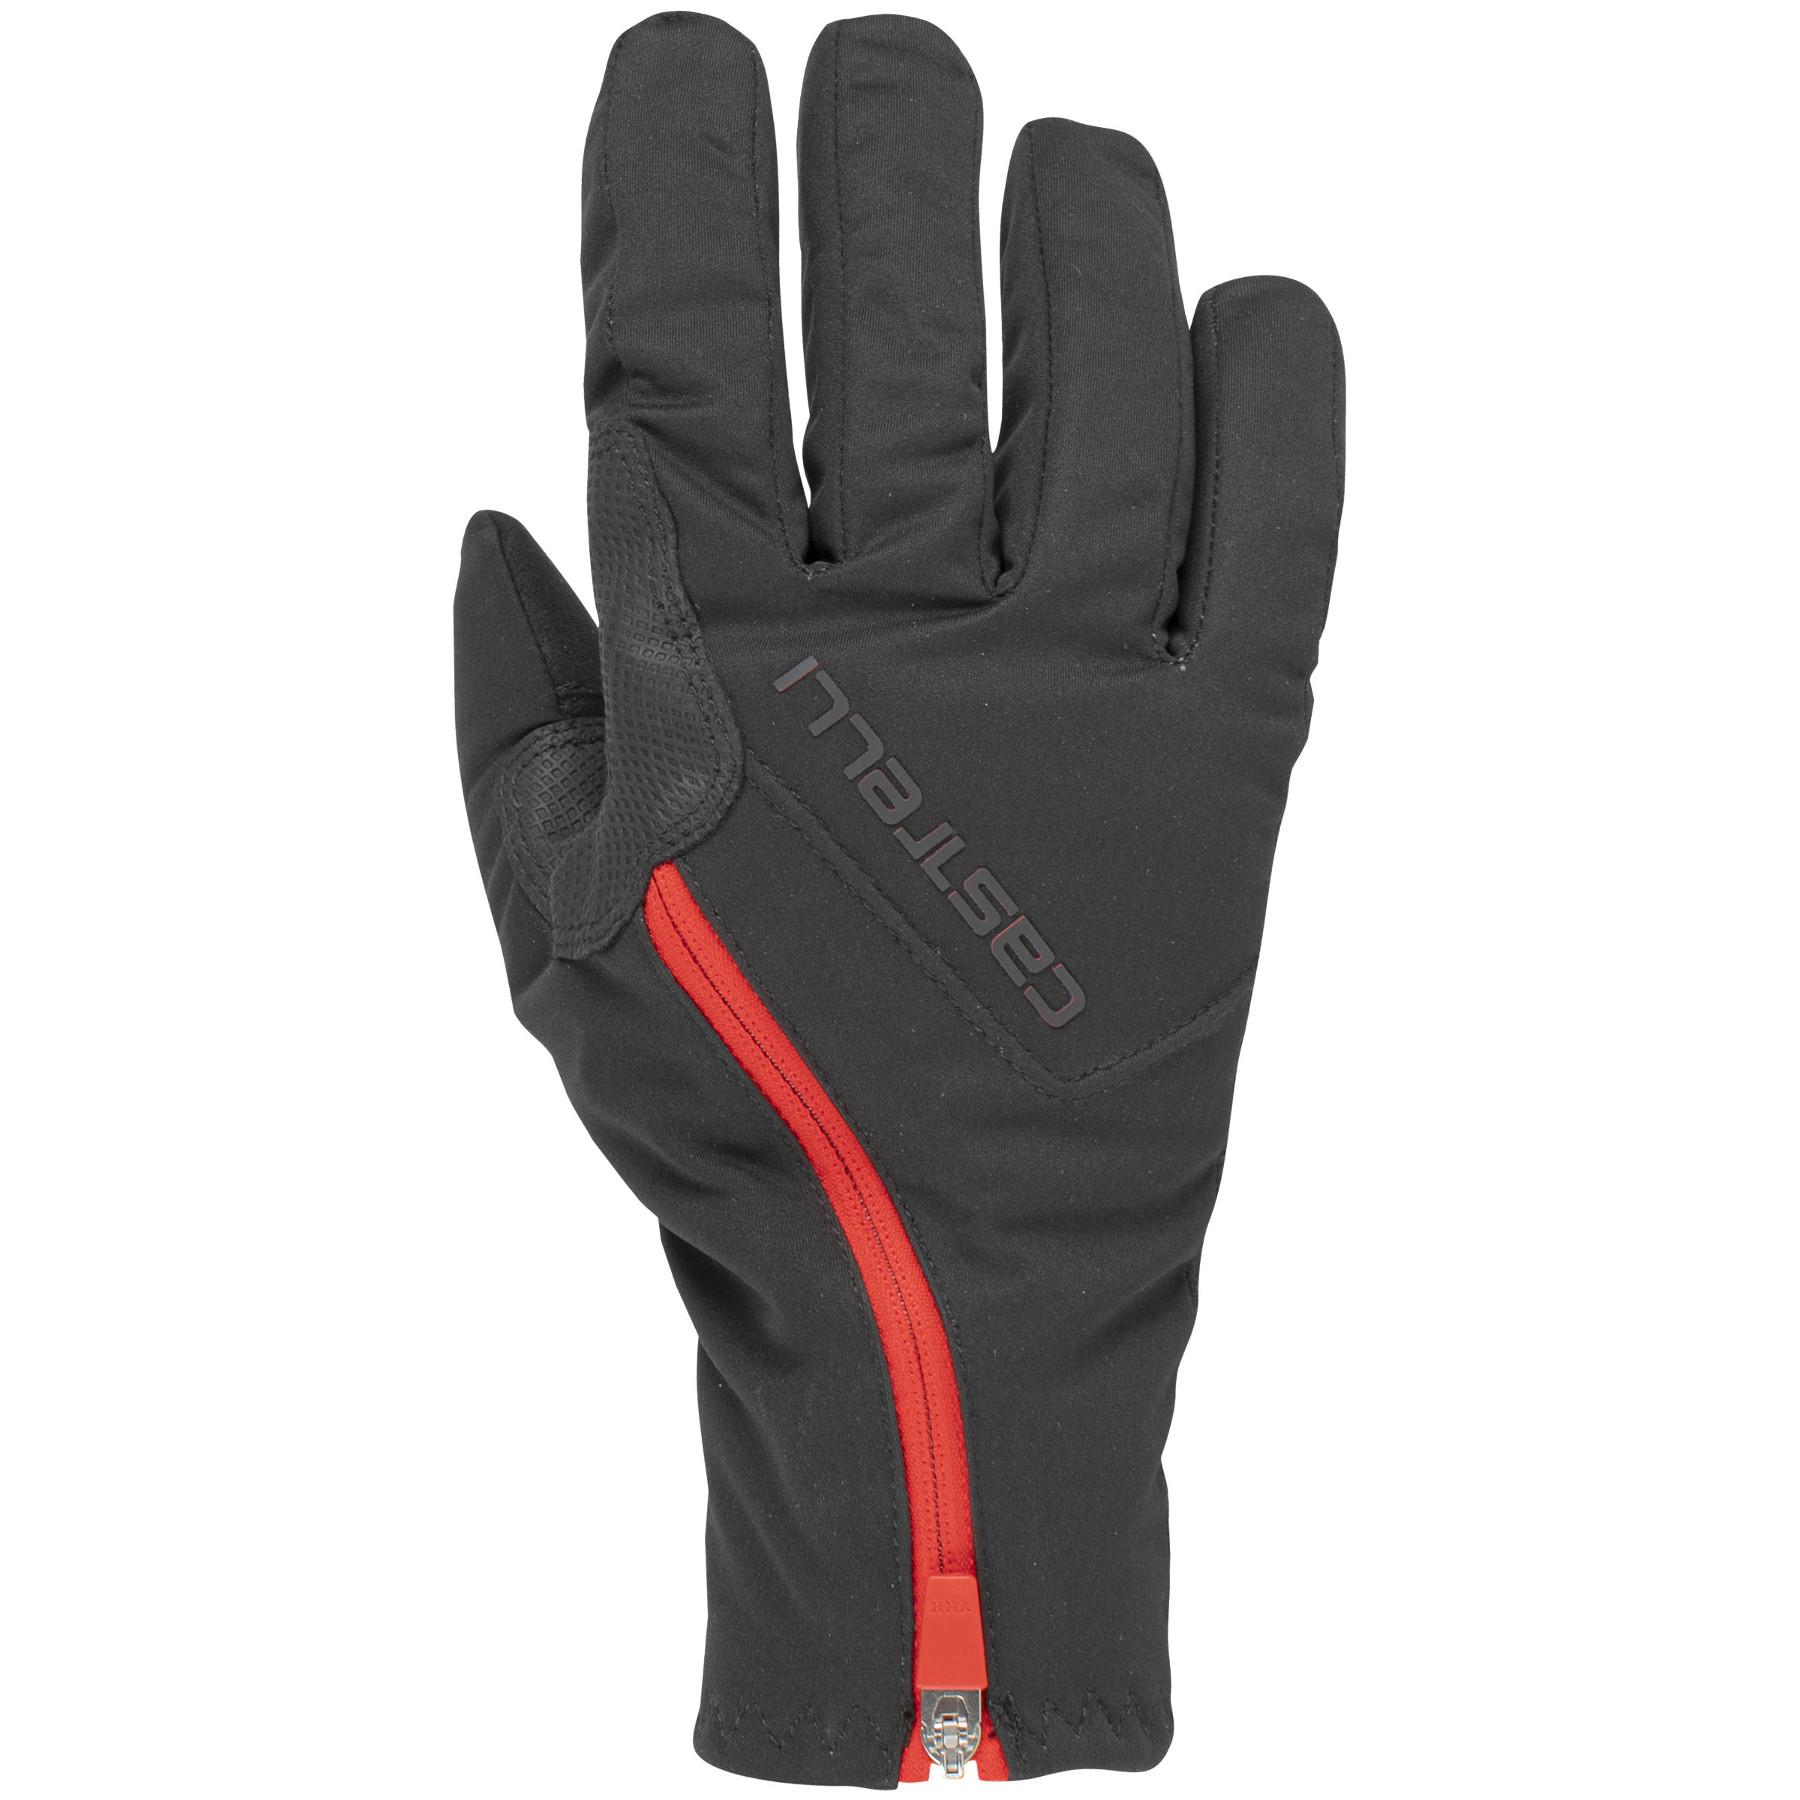 Castelli Spettacolo RoS W Gloves - black 010